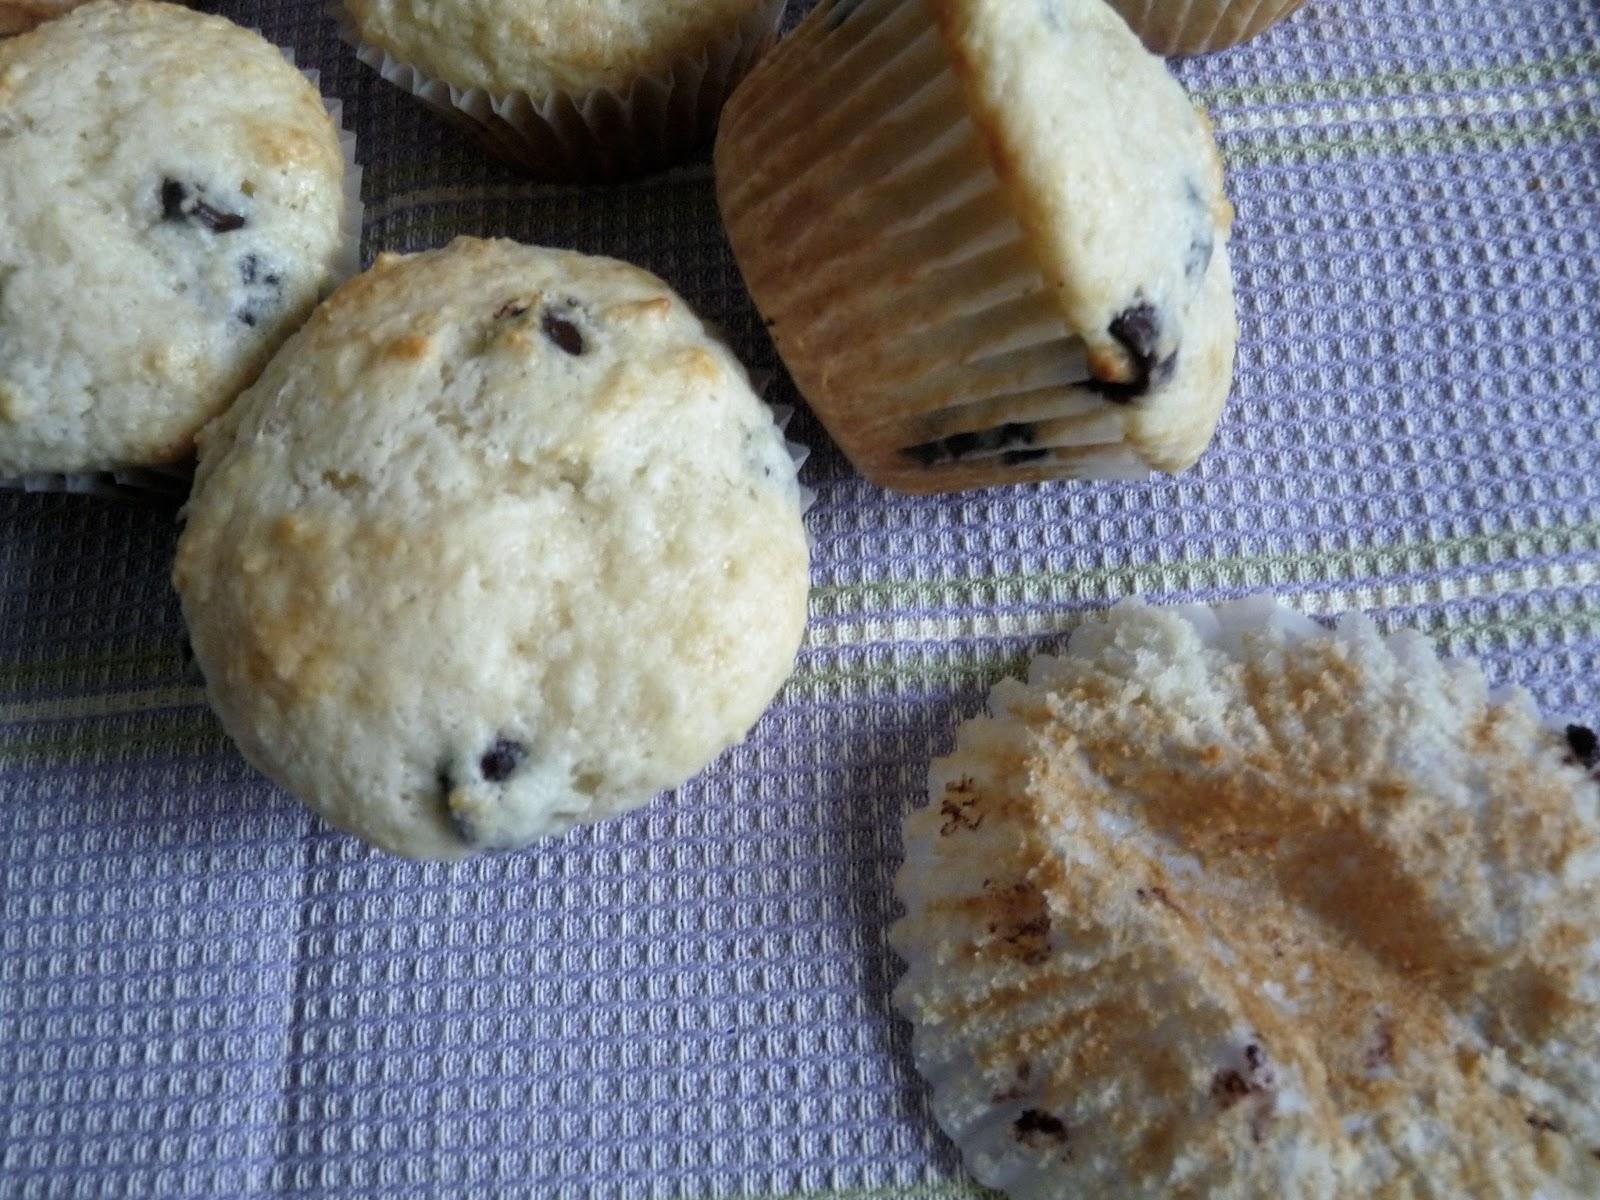 Sour Cream & Chocolate Chip Mini Muffins